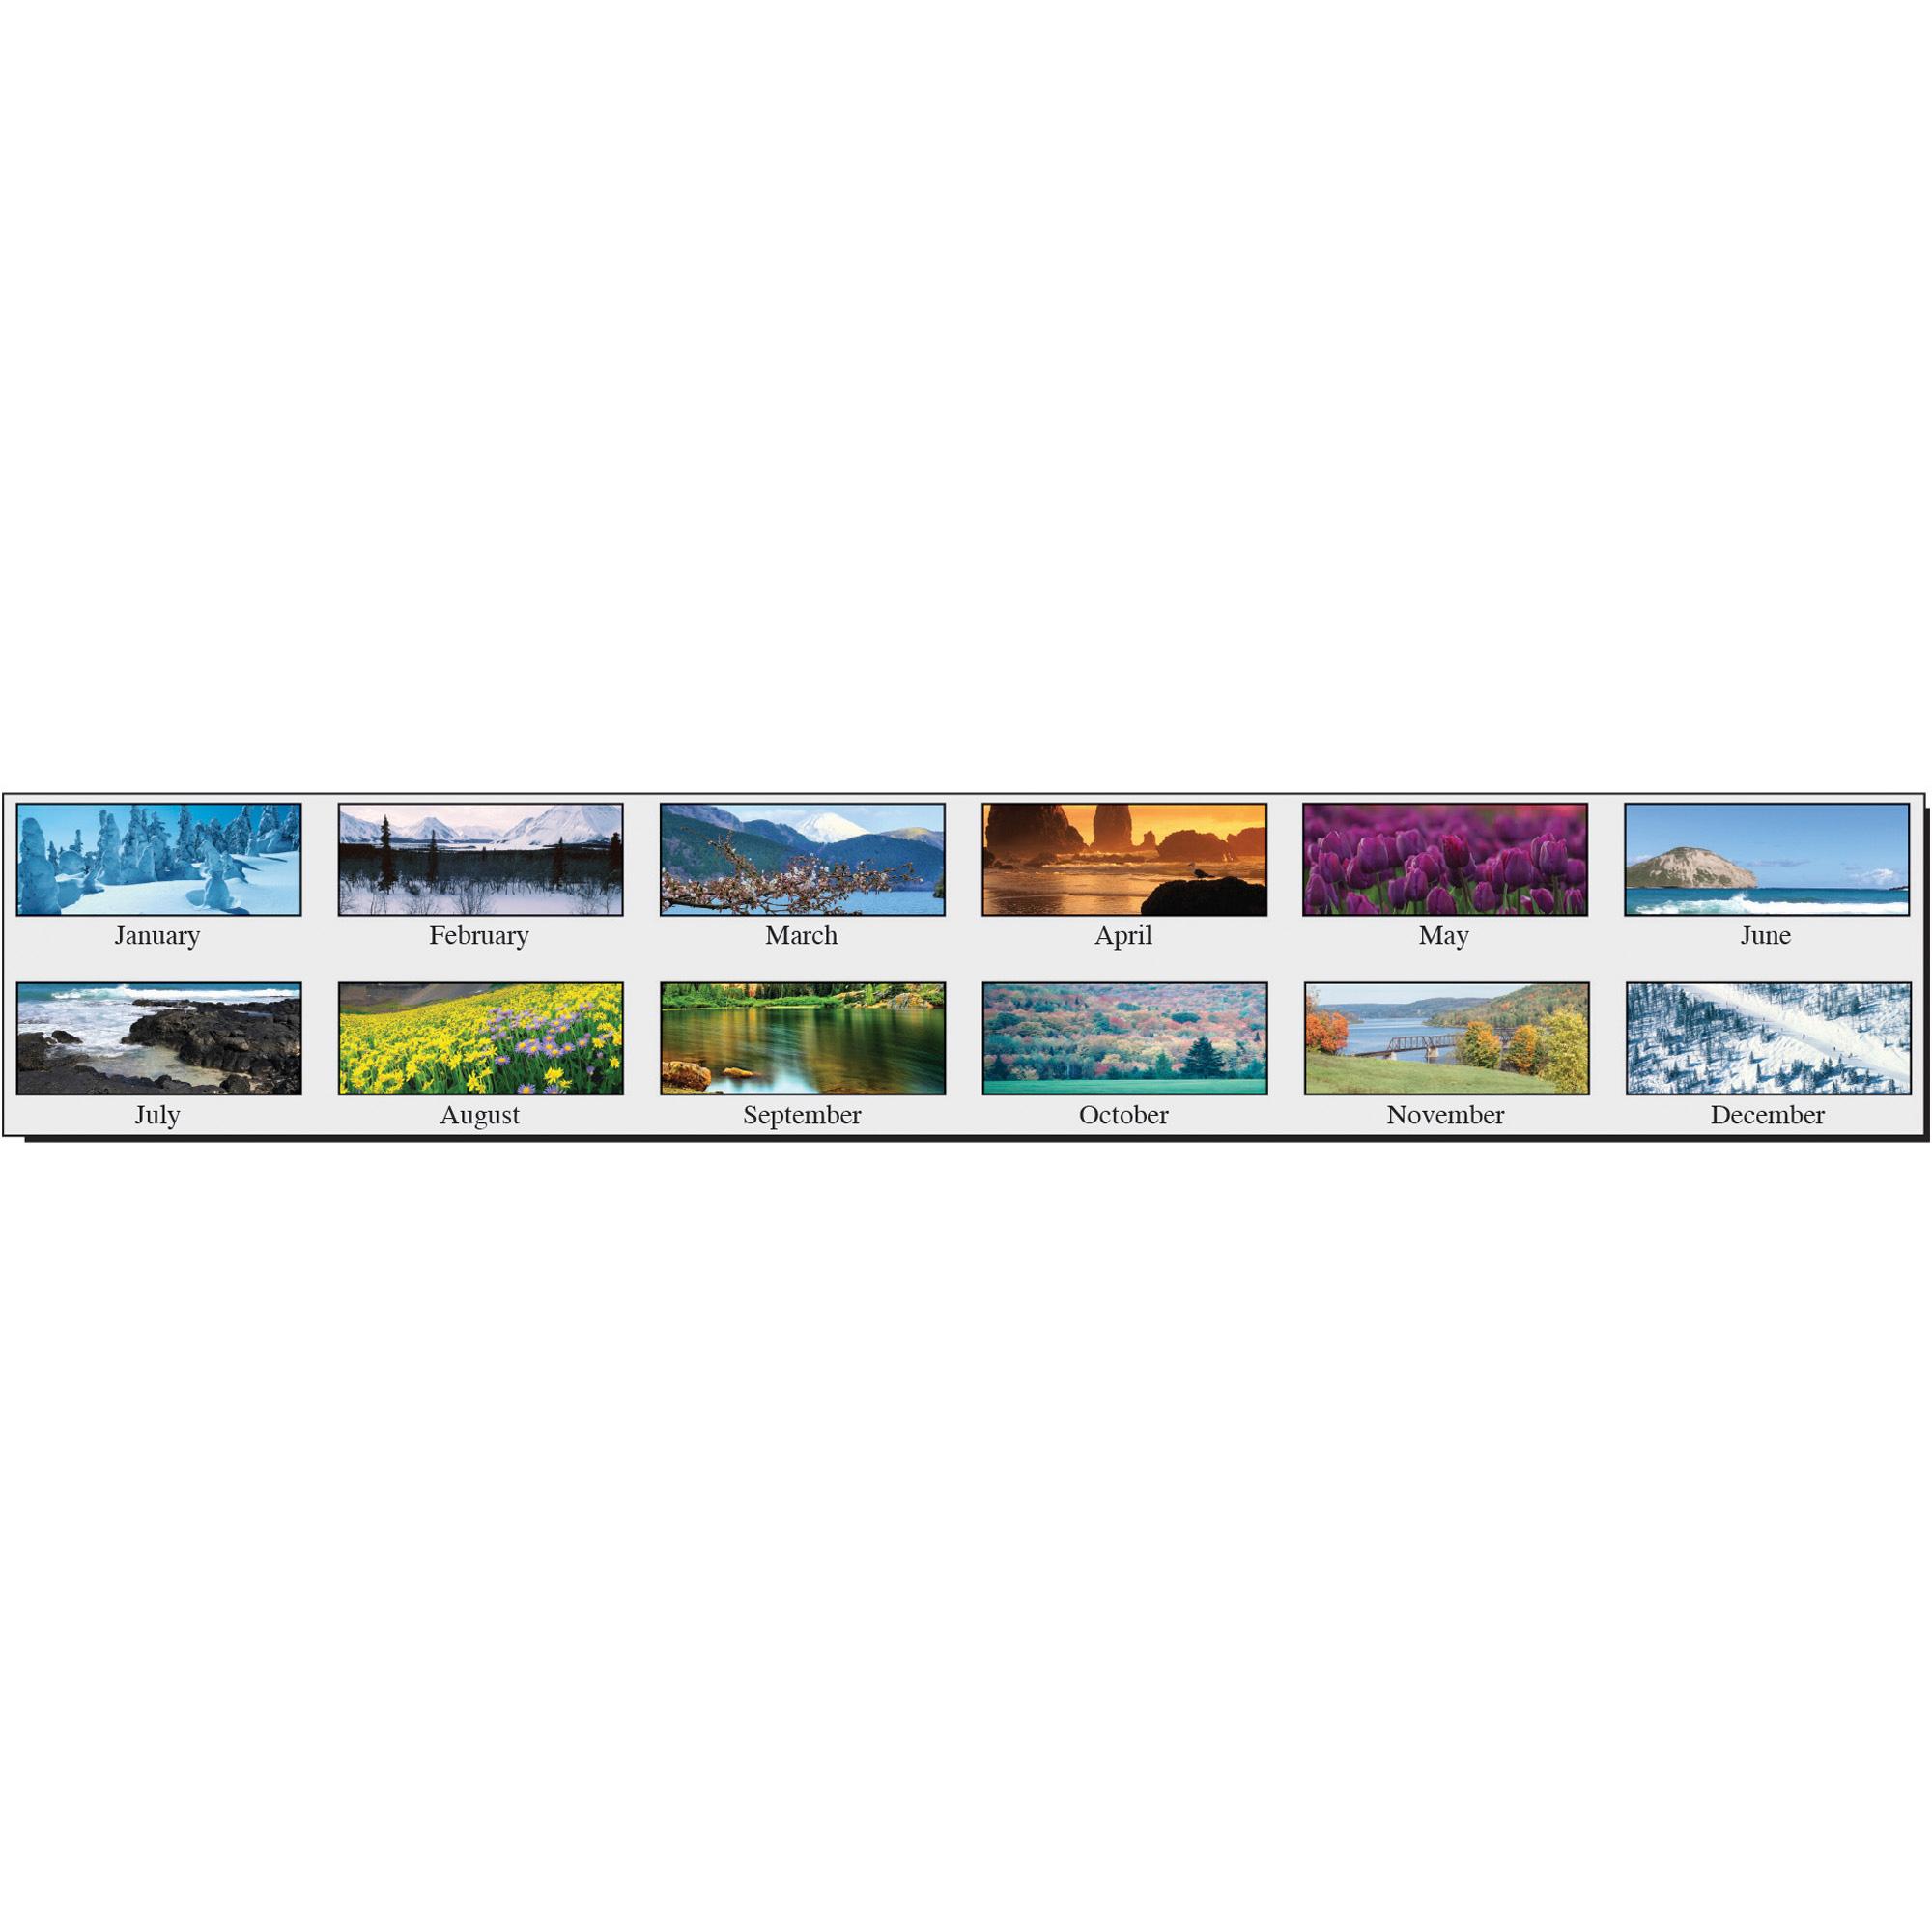 House Of Doolittle Scenic 3-Month Wall Calendar | Walker'S throughout January 2022 Calendar With Julian Dates